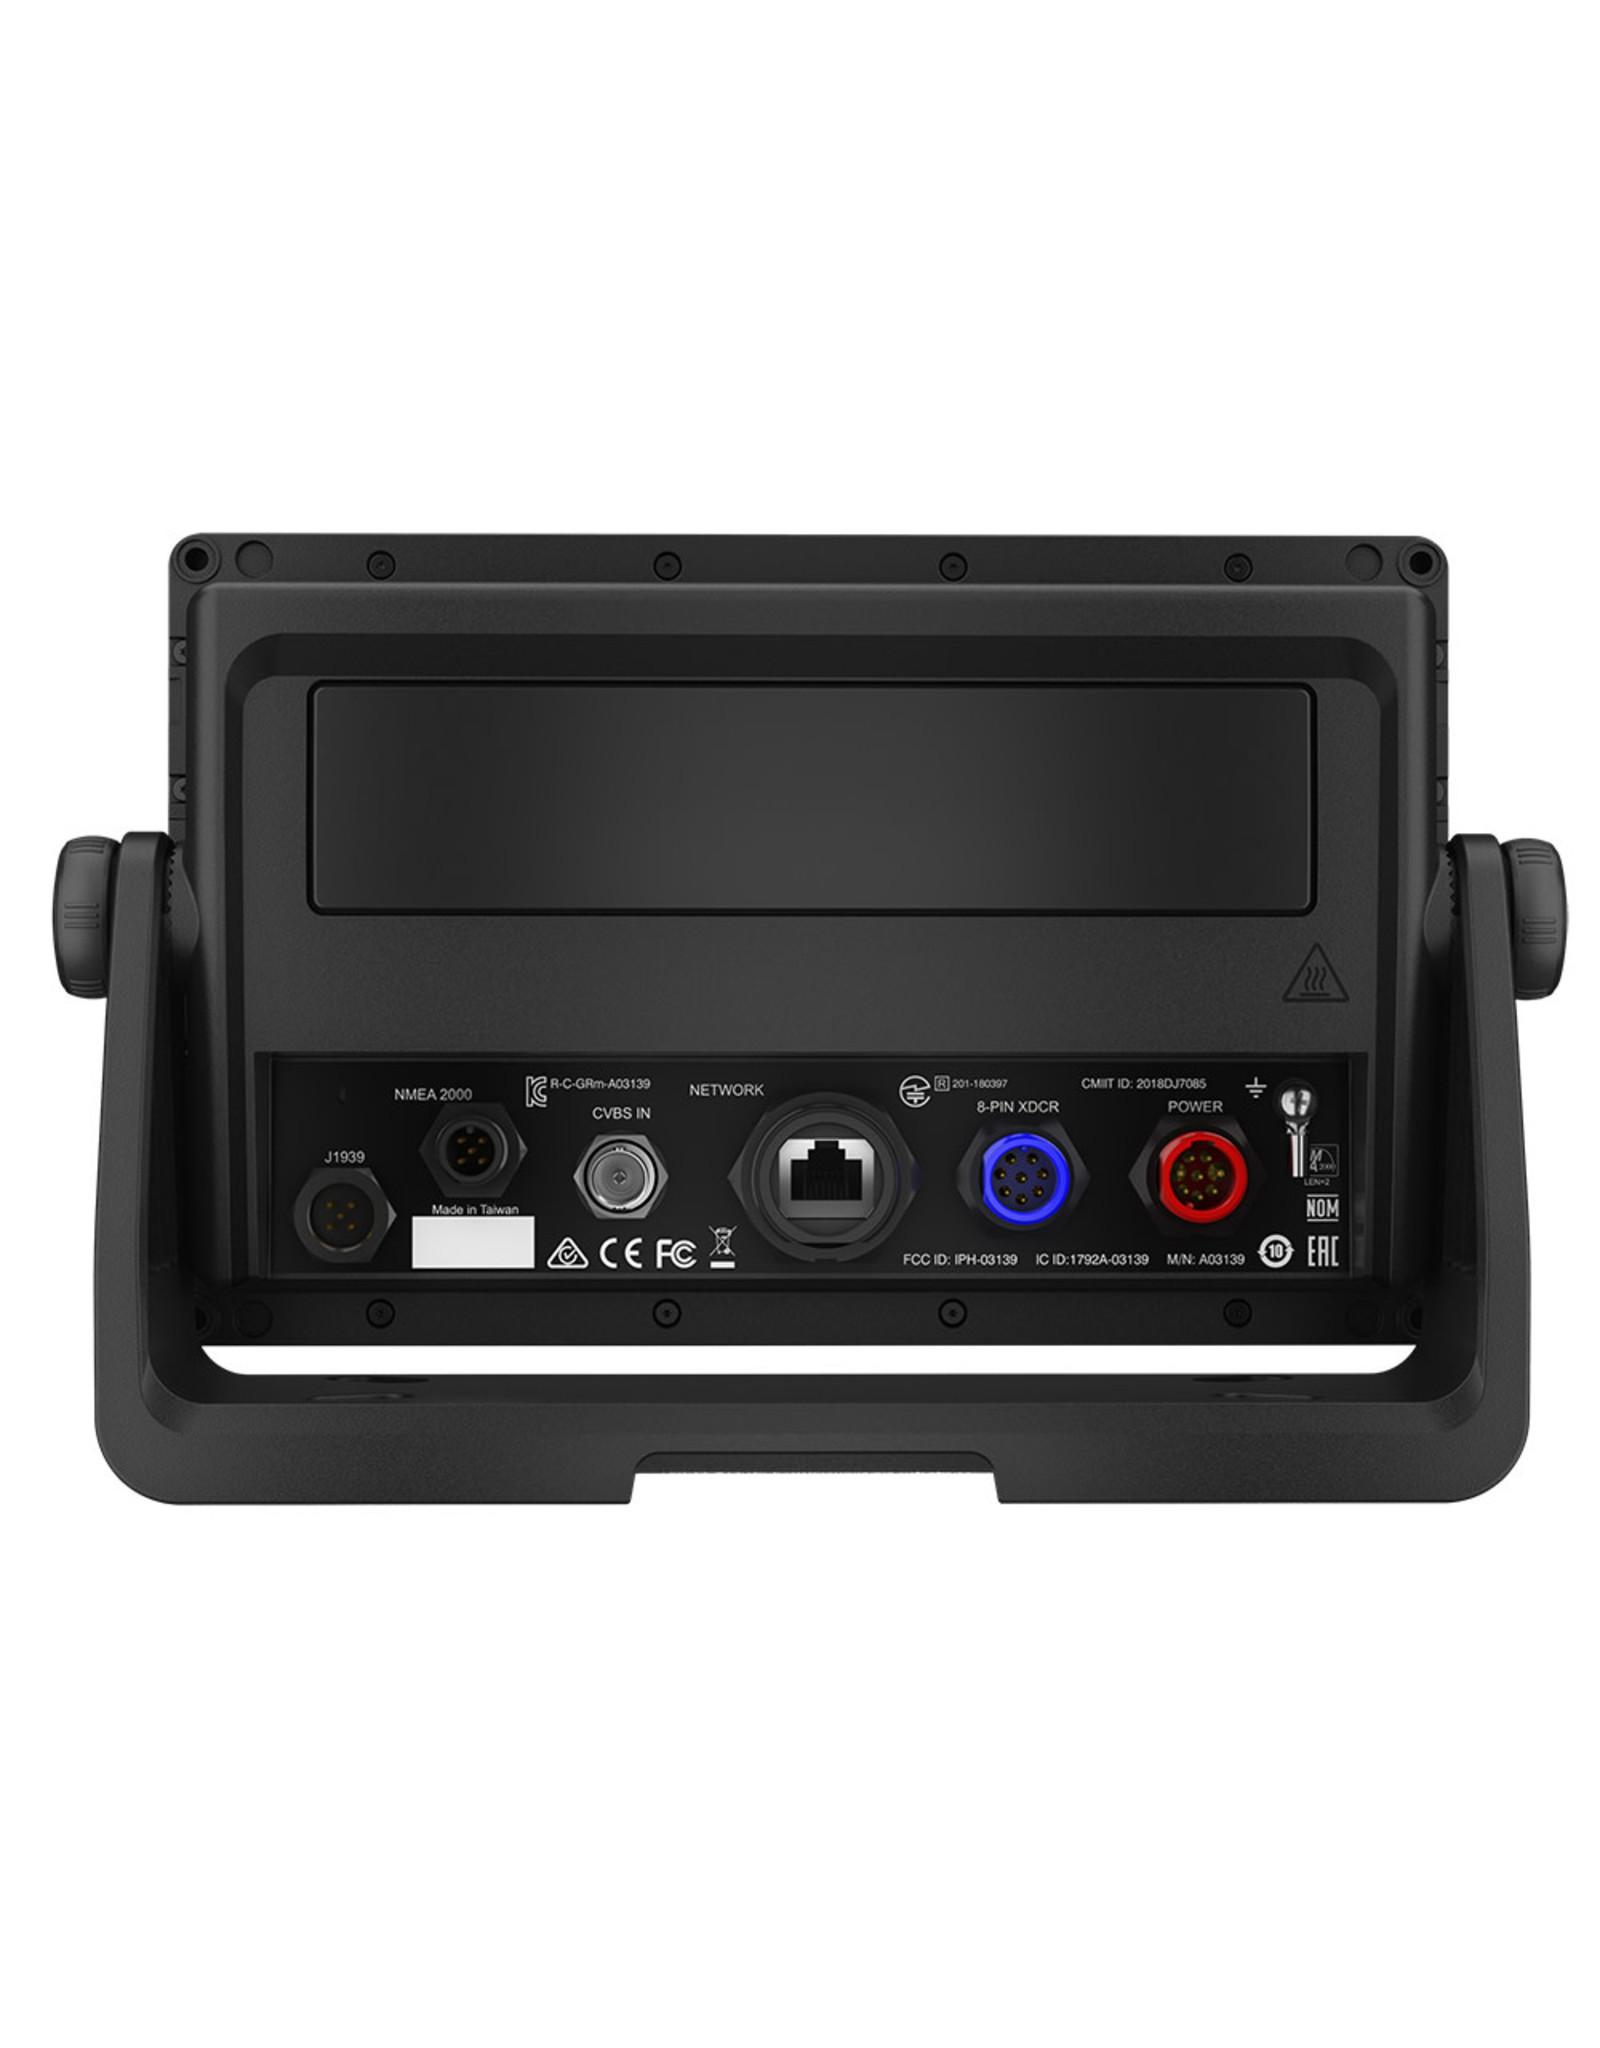 Garmin GPSMAP® 742xs Plus Touchscreen GPS/Fishfinder Combo